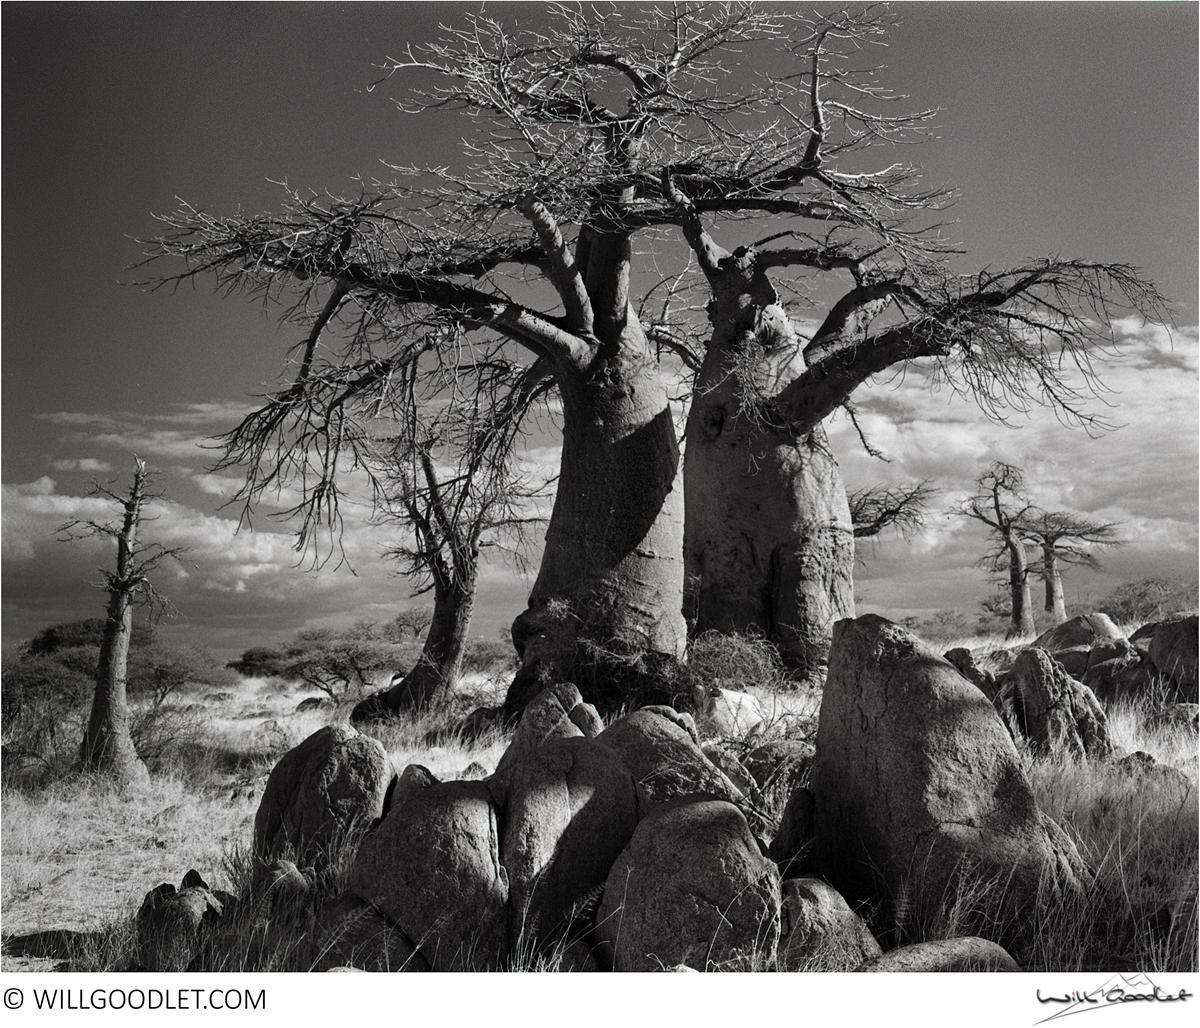 Baobabs, Kodak Tri-X 400